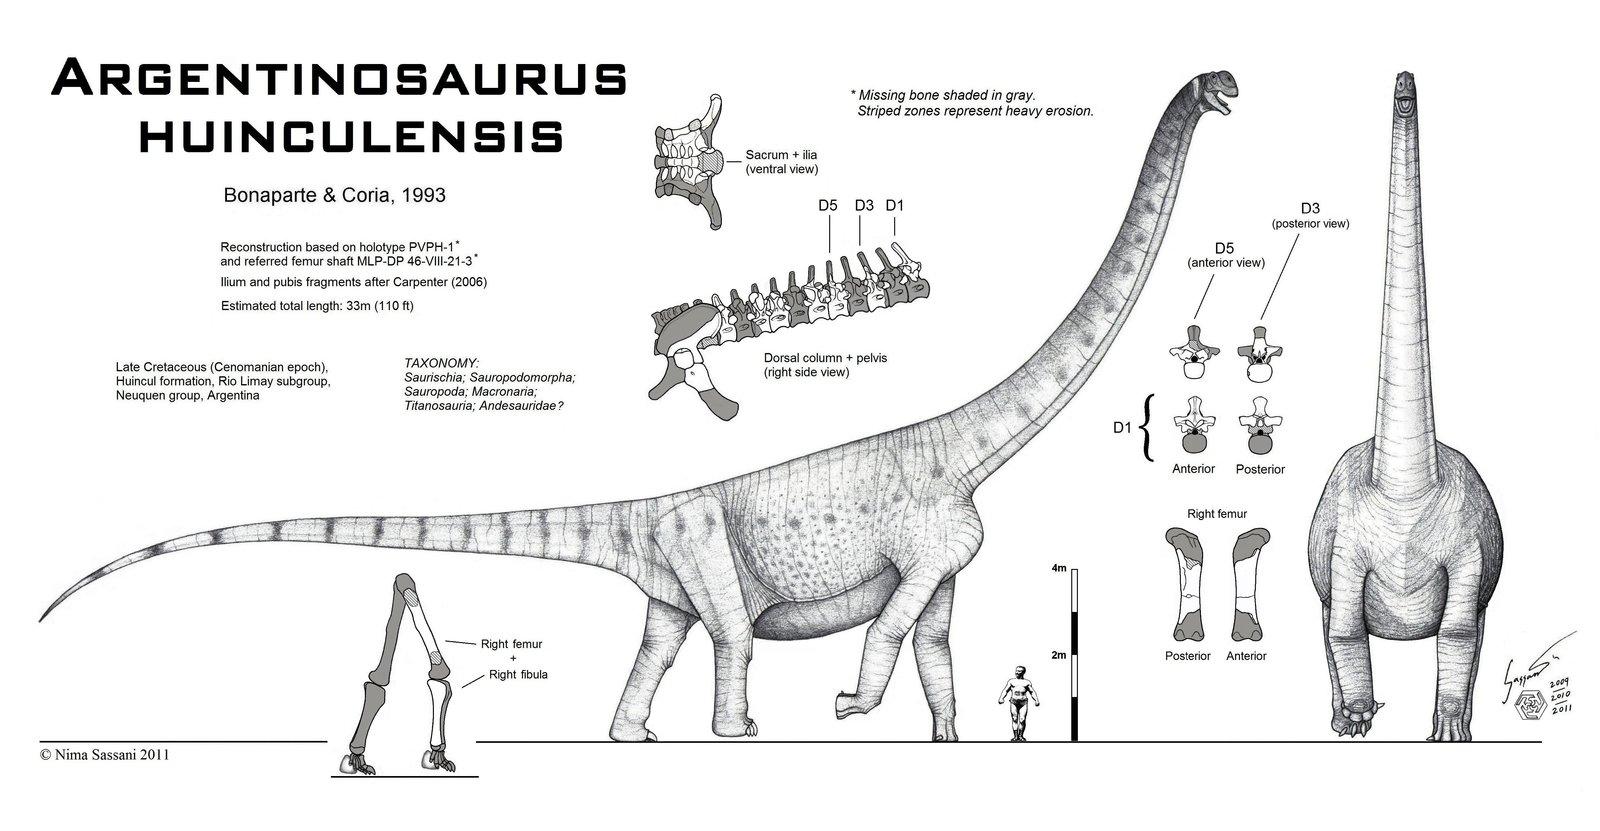 http://dinosaurs.afly.ru/ii/z/argentinosaurus-1.jpg